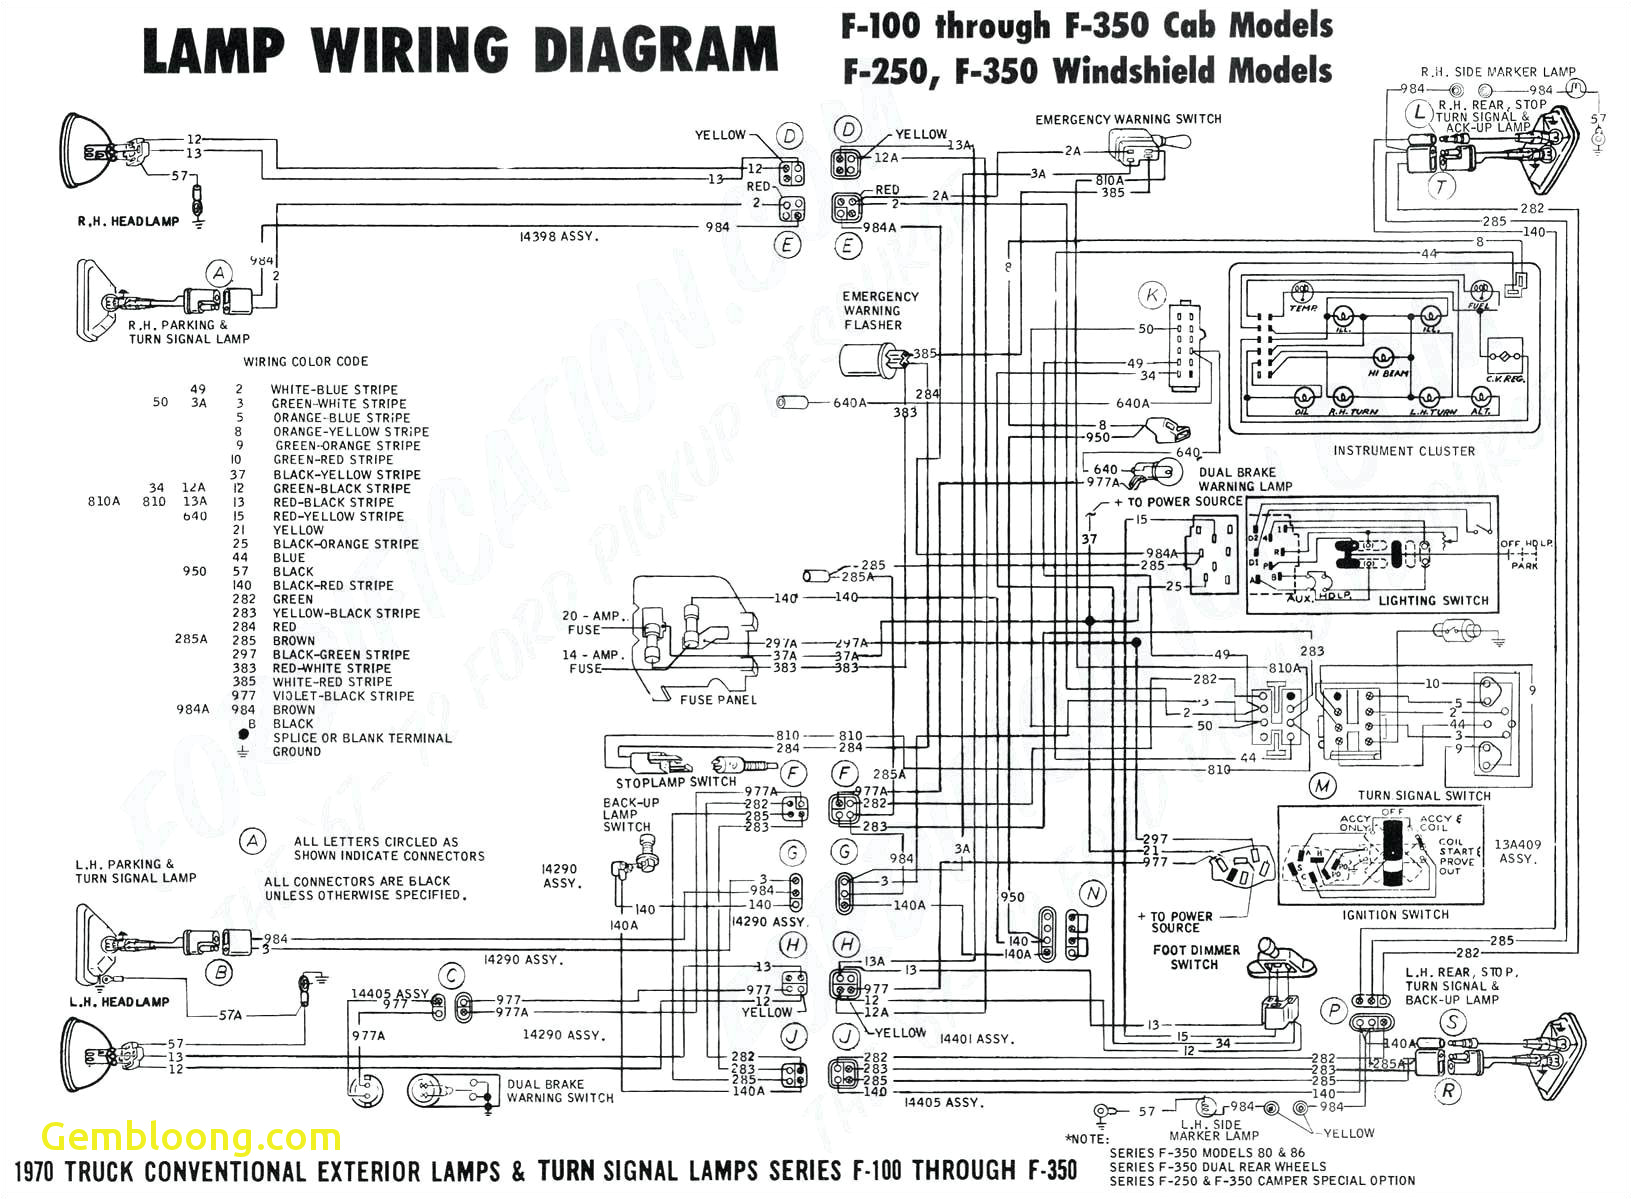 1991 gm ignition switch wiring diagram wiring diagram center sel ignition switch wiring diagram